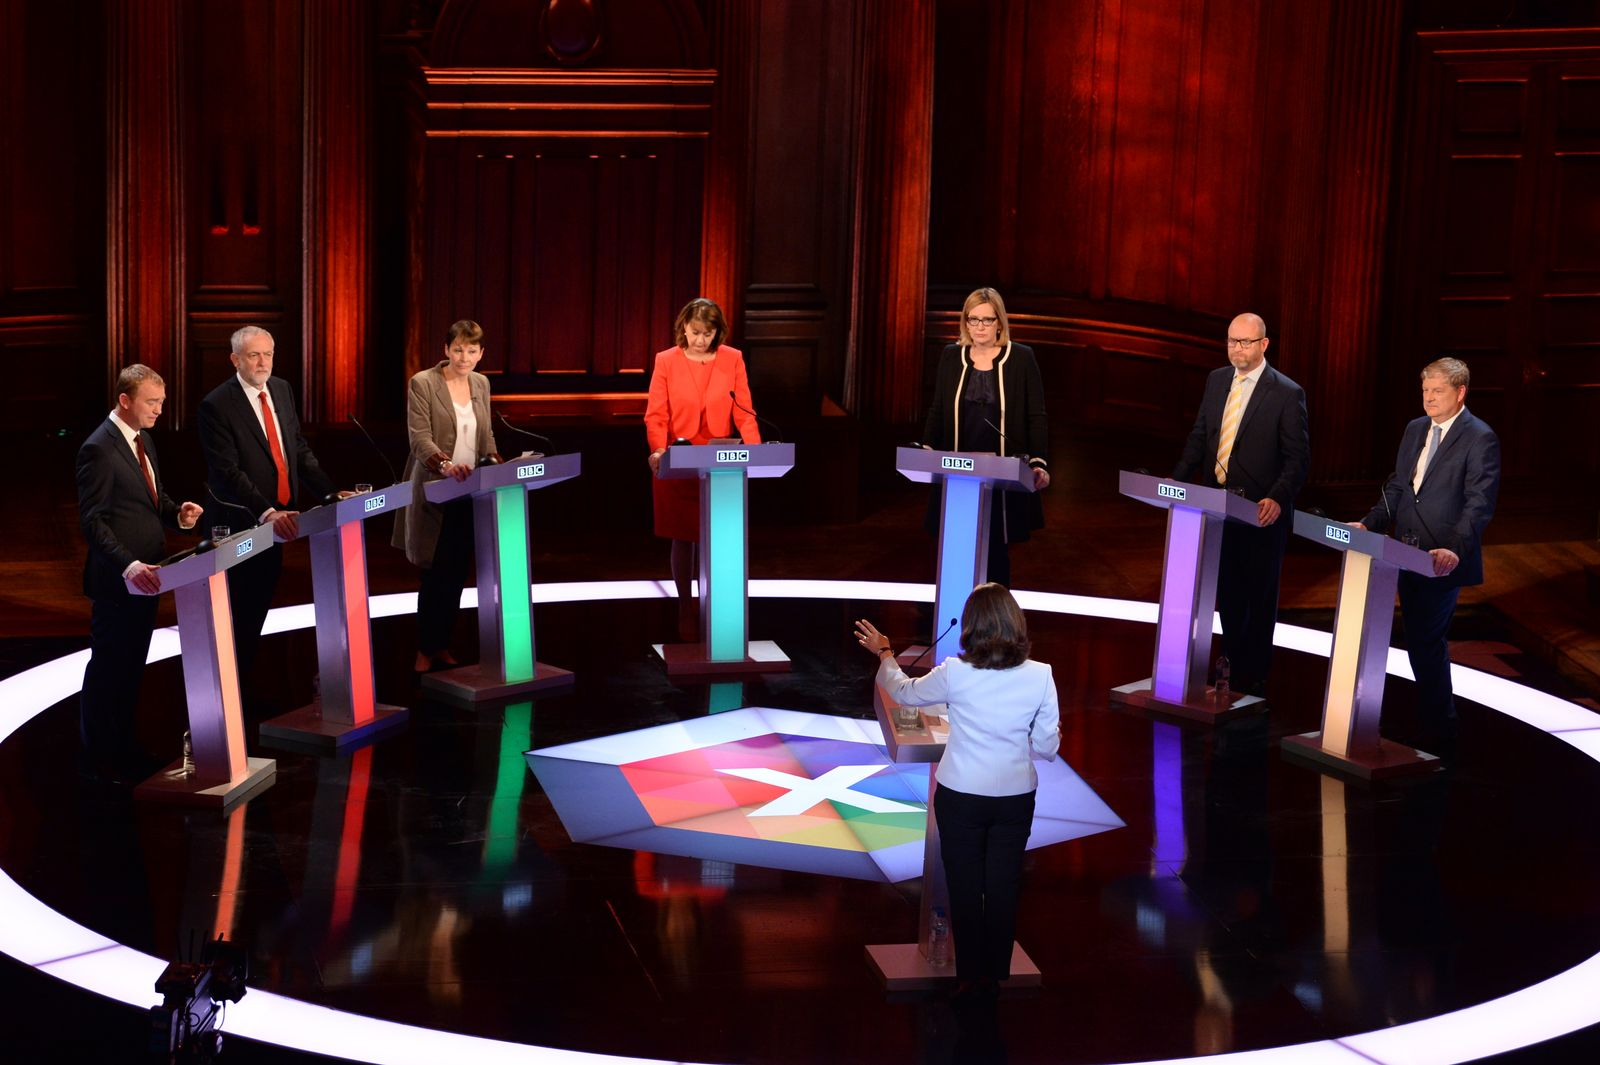 Großbritannien Debatte